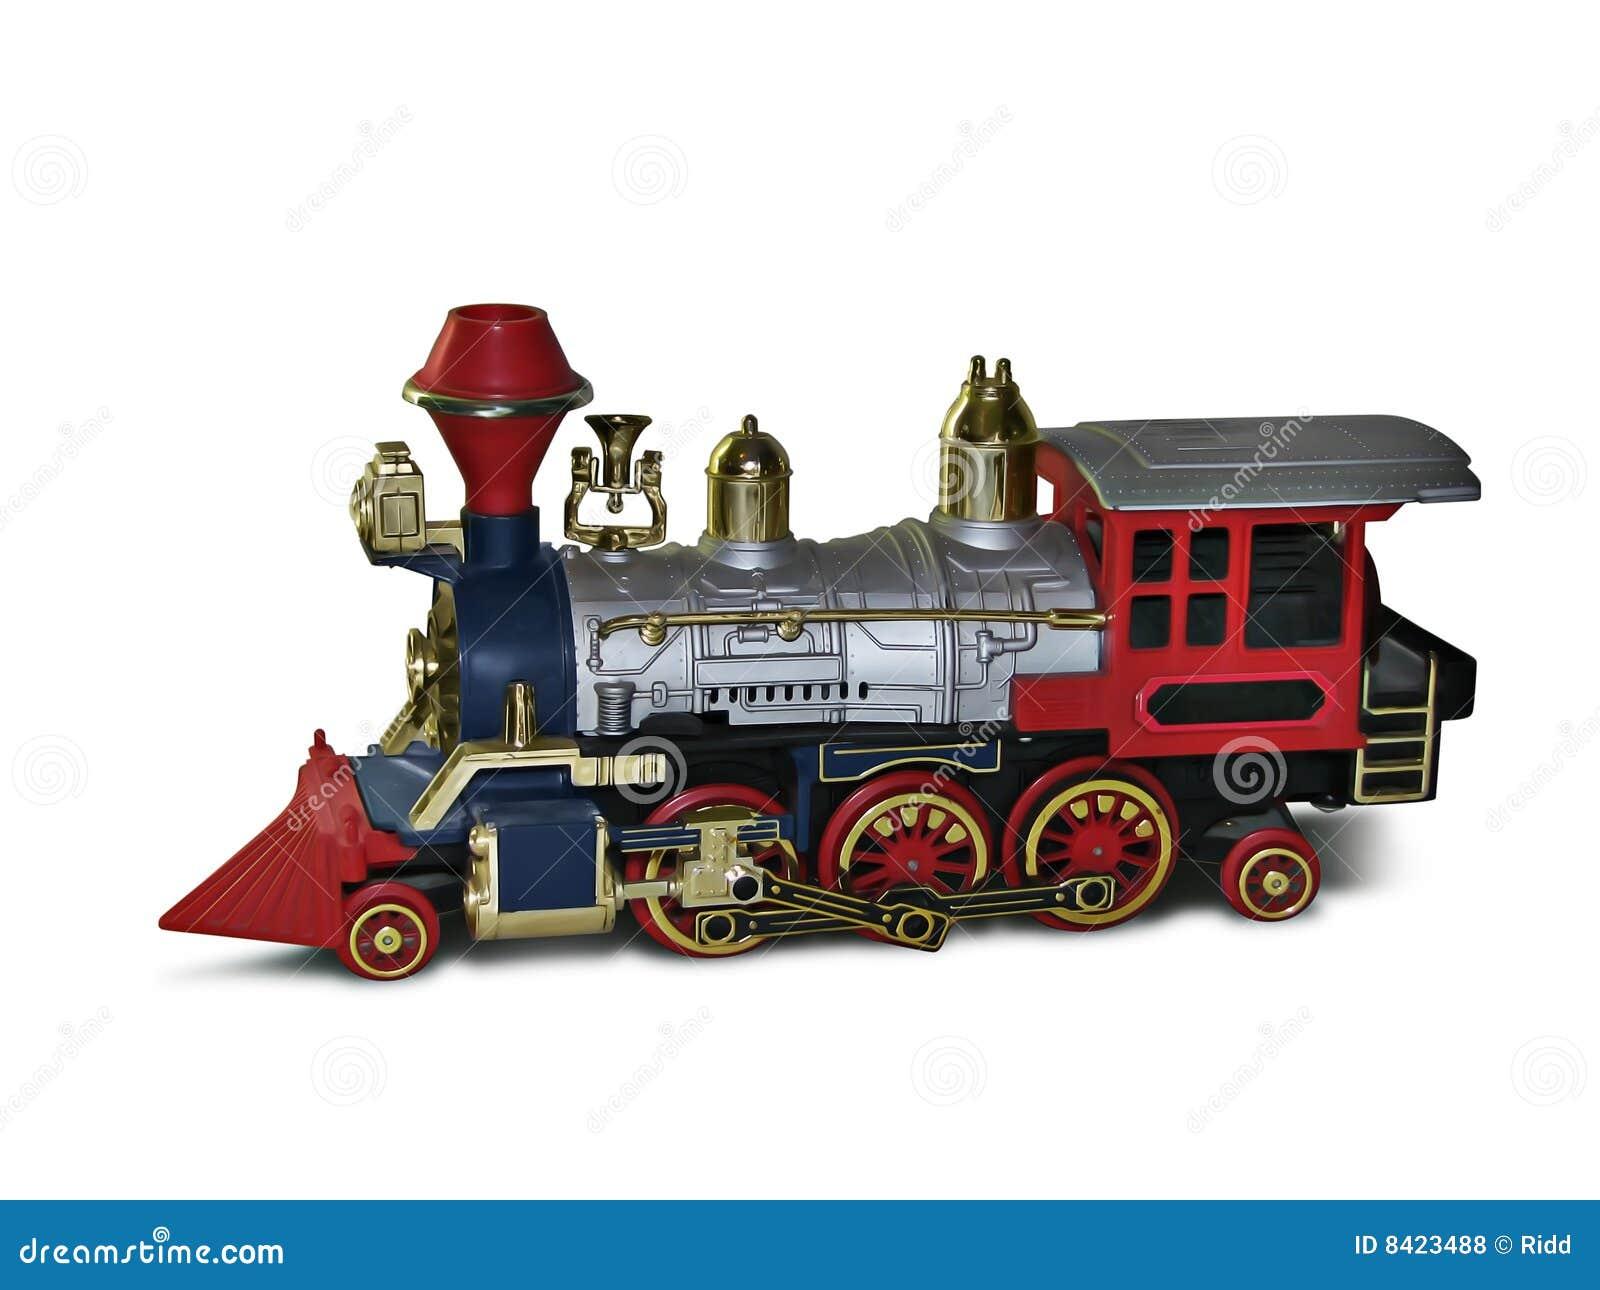 Toy Locomotive Royalty Free Stock Photos - Image: 8423488